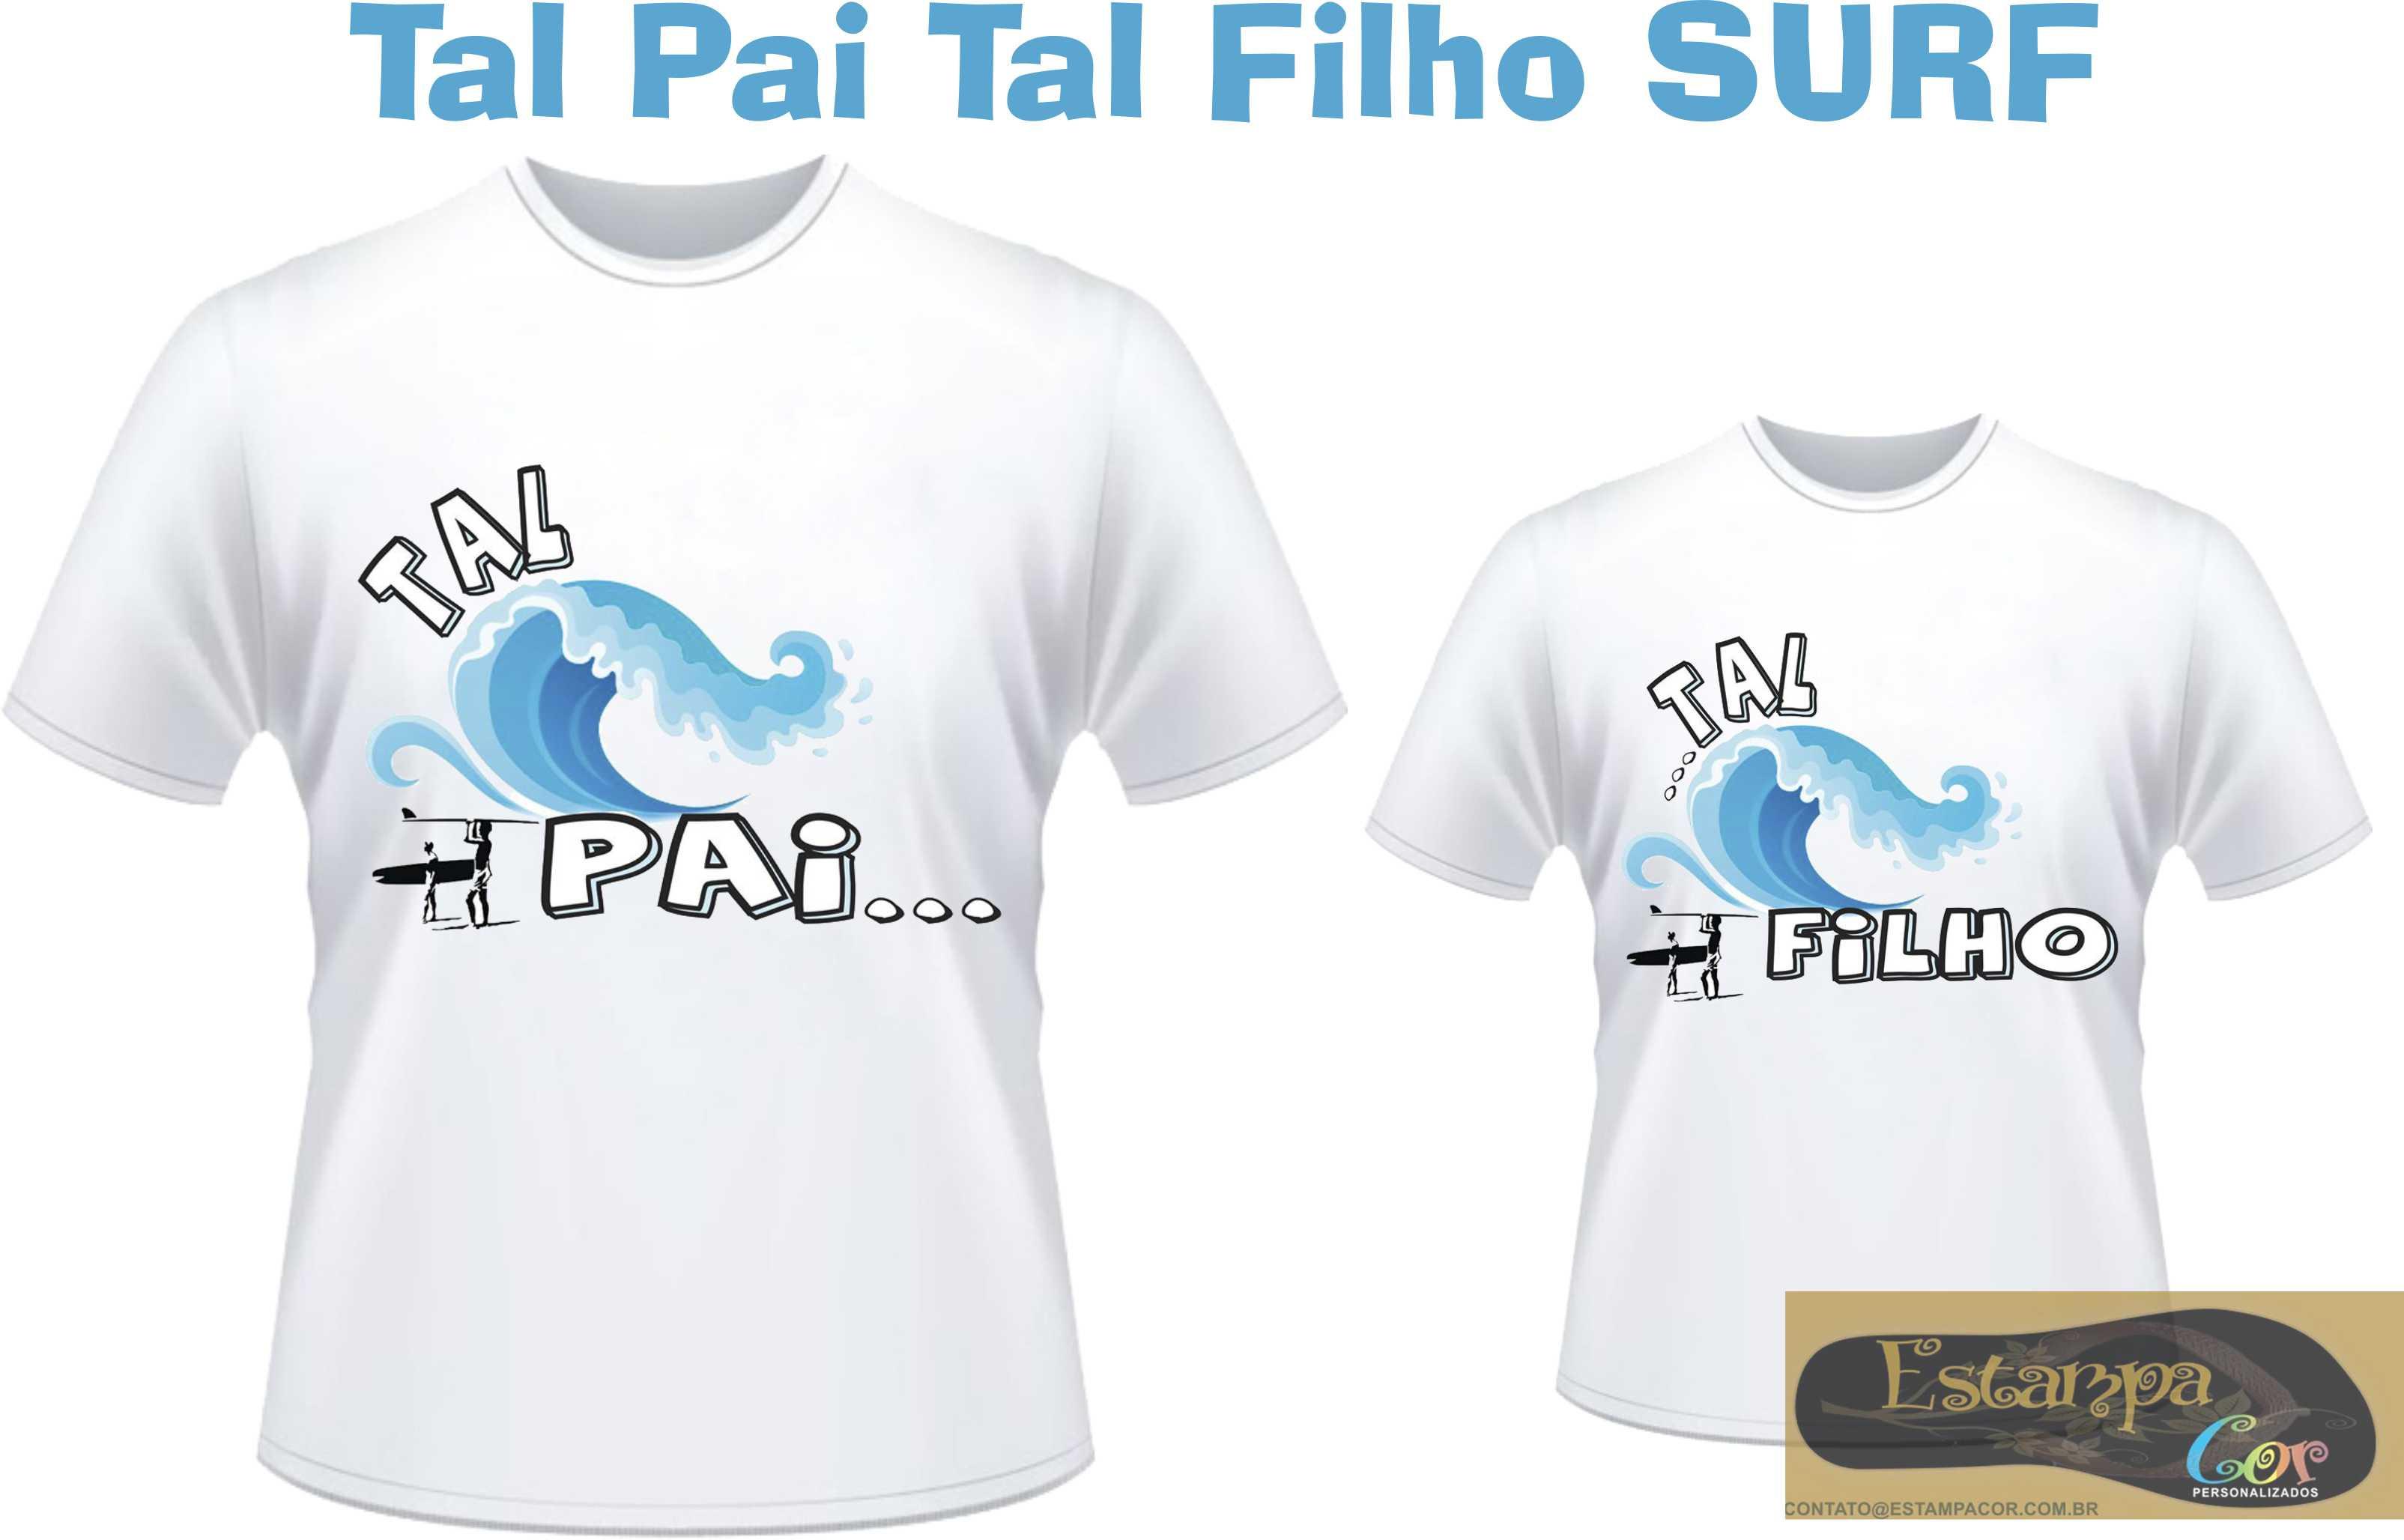 Camiseta Personalizada Tal Pai Tal Filho SURF (monte o seu Kit)